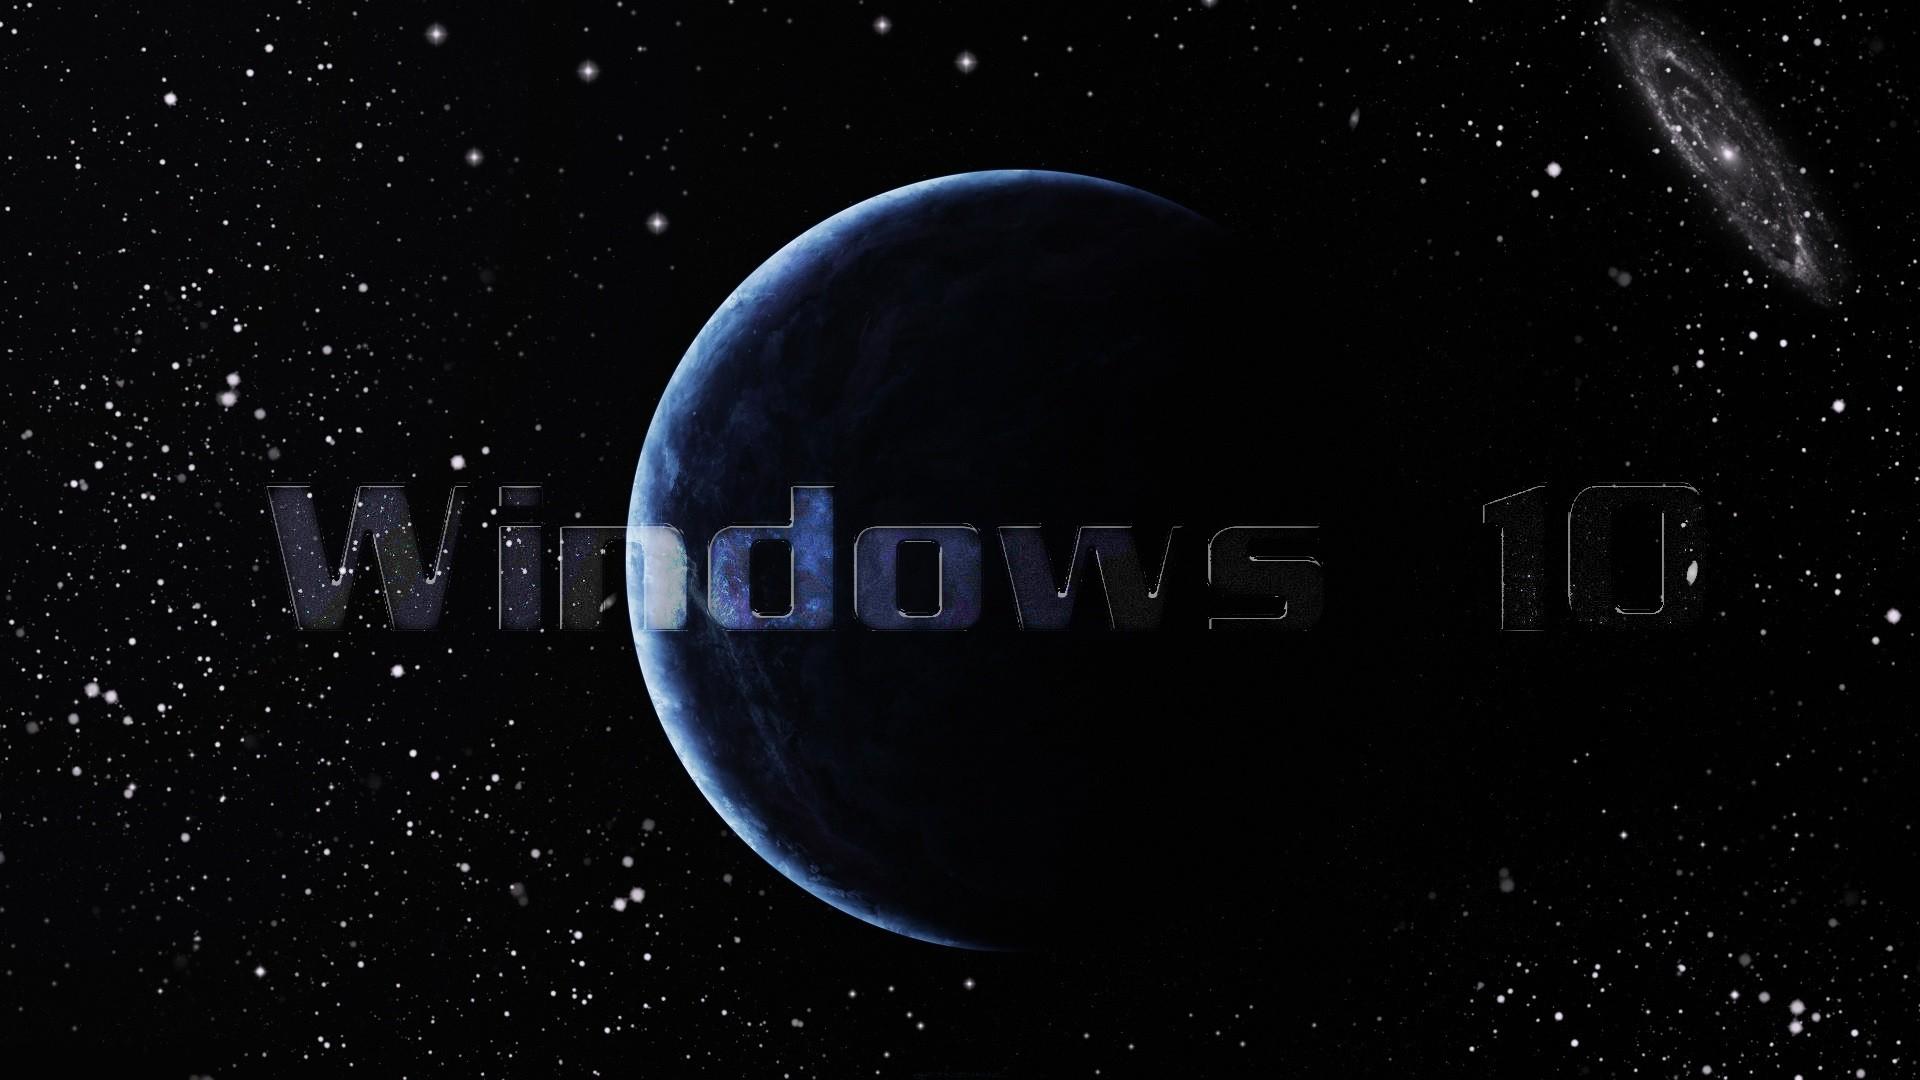 Windows 10 wallpaper hd 1080p download free beautiful for 1080p 1920x1080